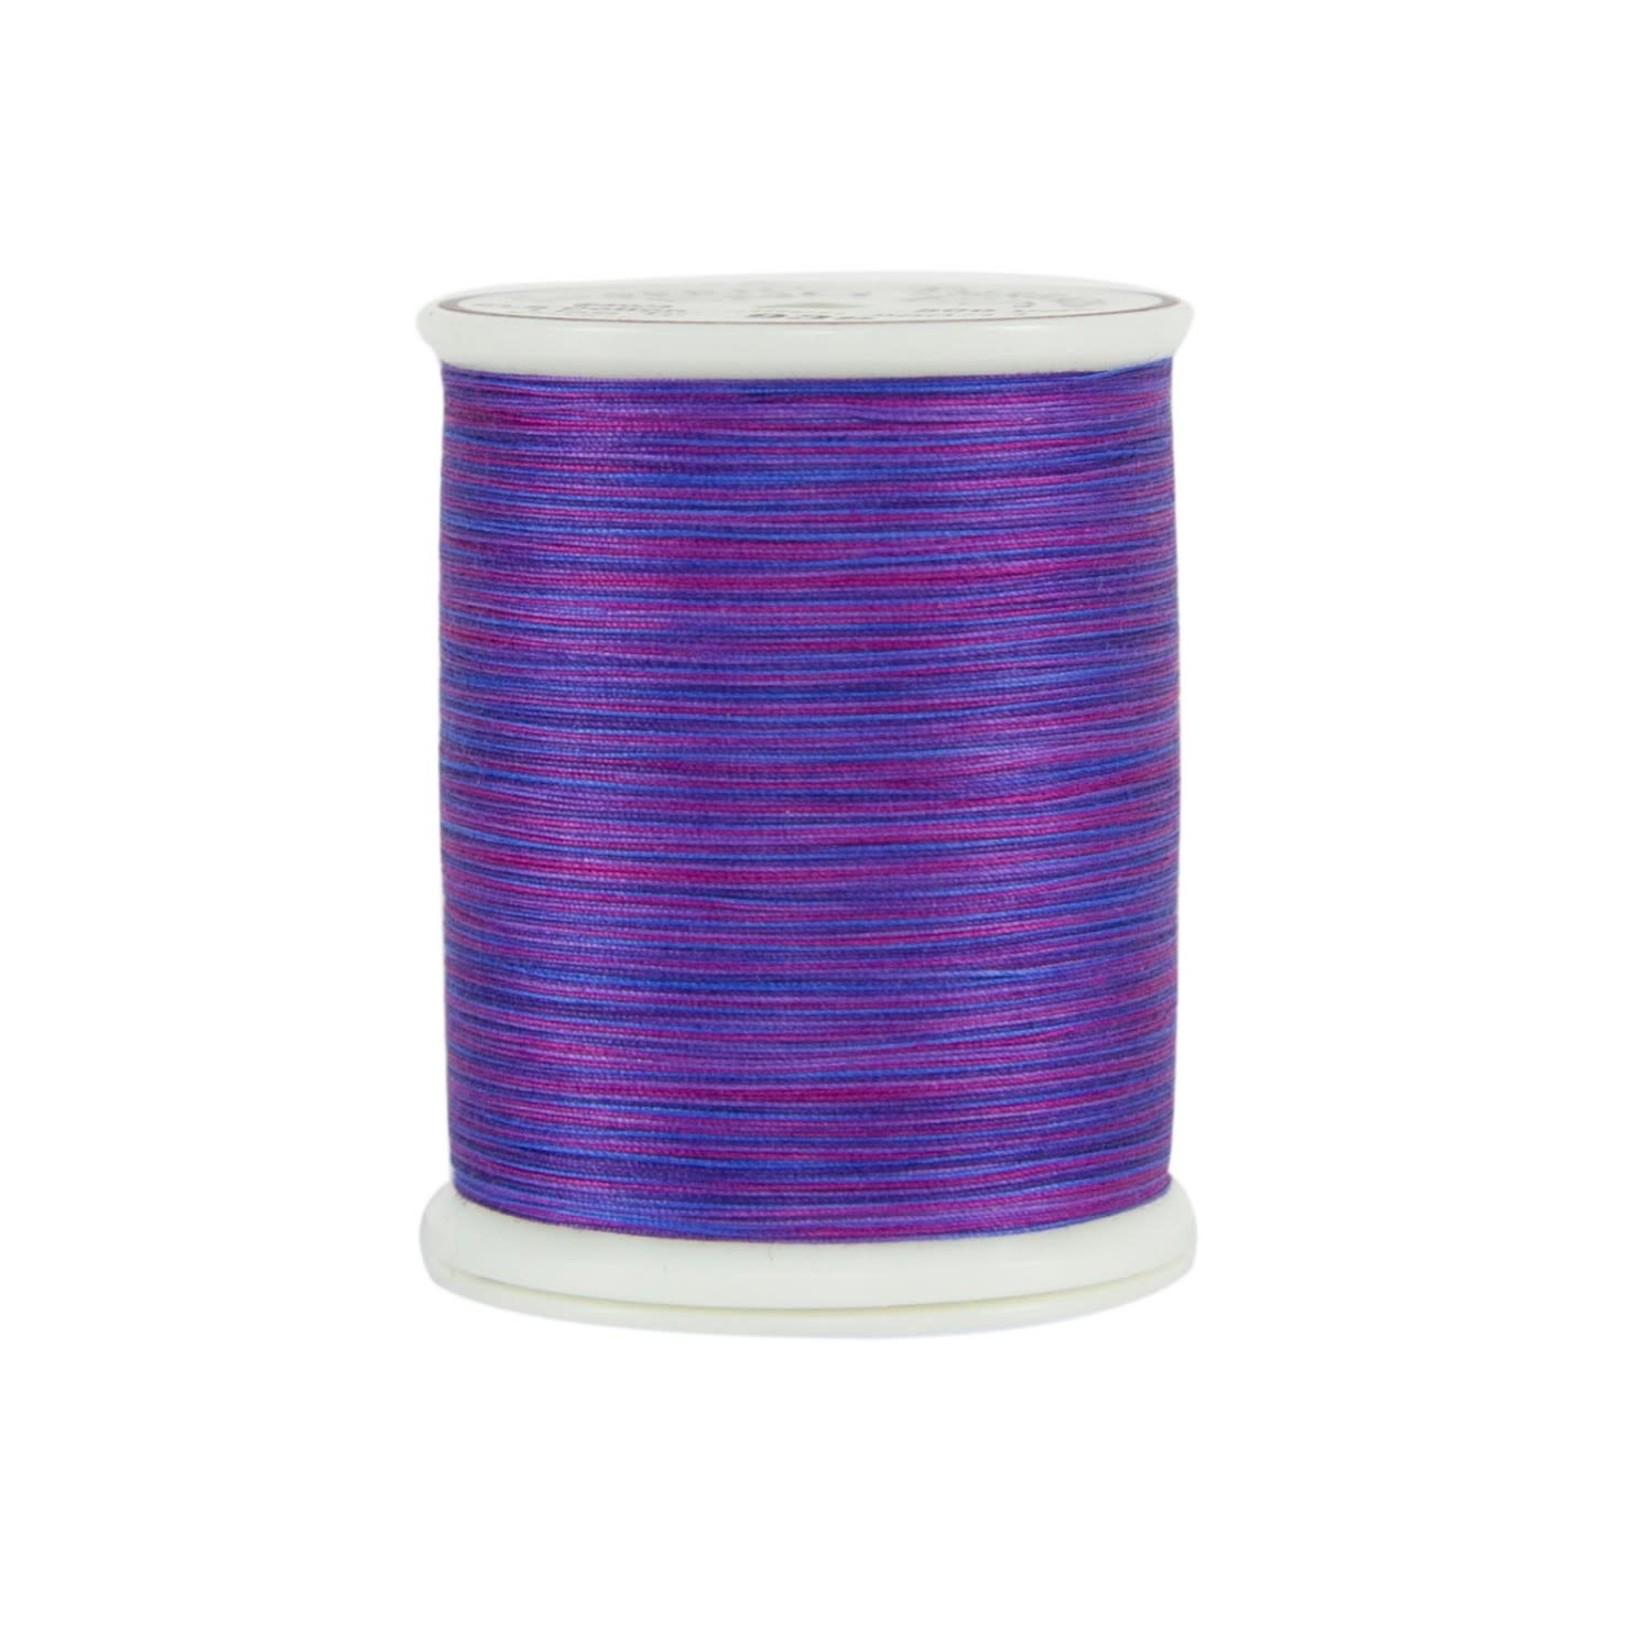 Superior Threads King Tut - #40 - 457 m - 0938 Luxorious